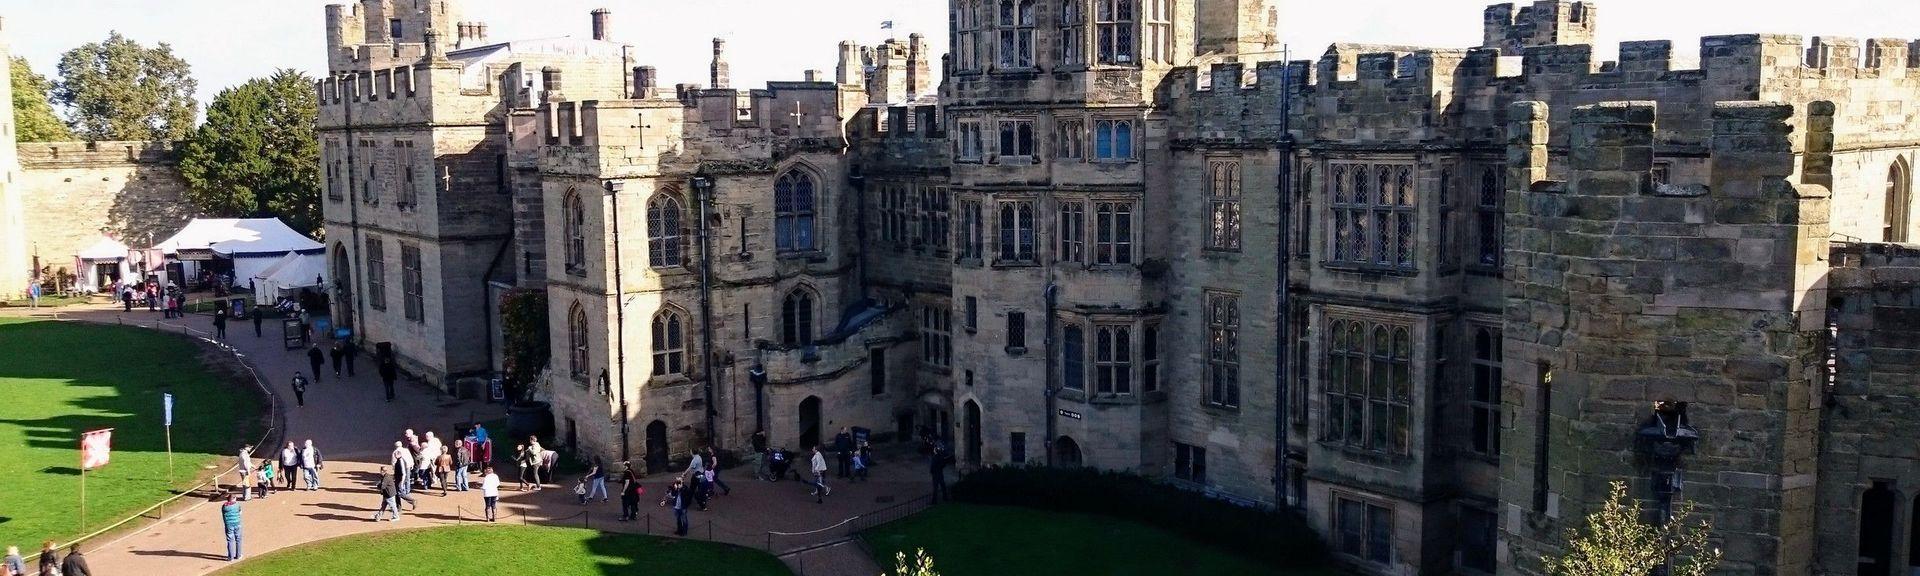 Warwick Castle, Warwick, England, United Kingdom